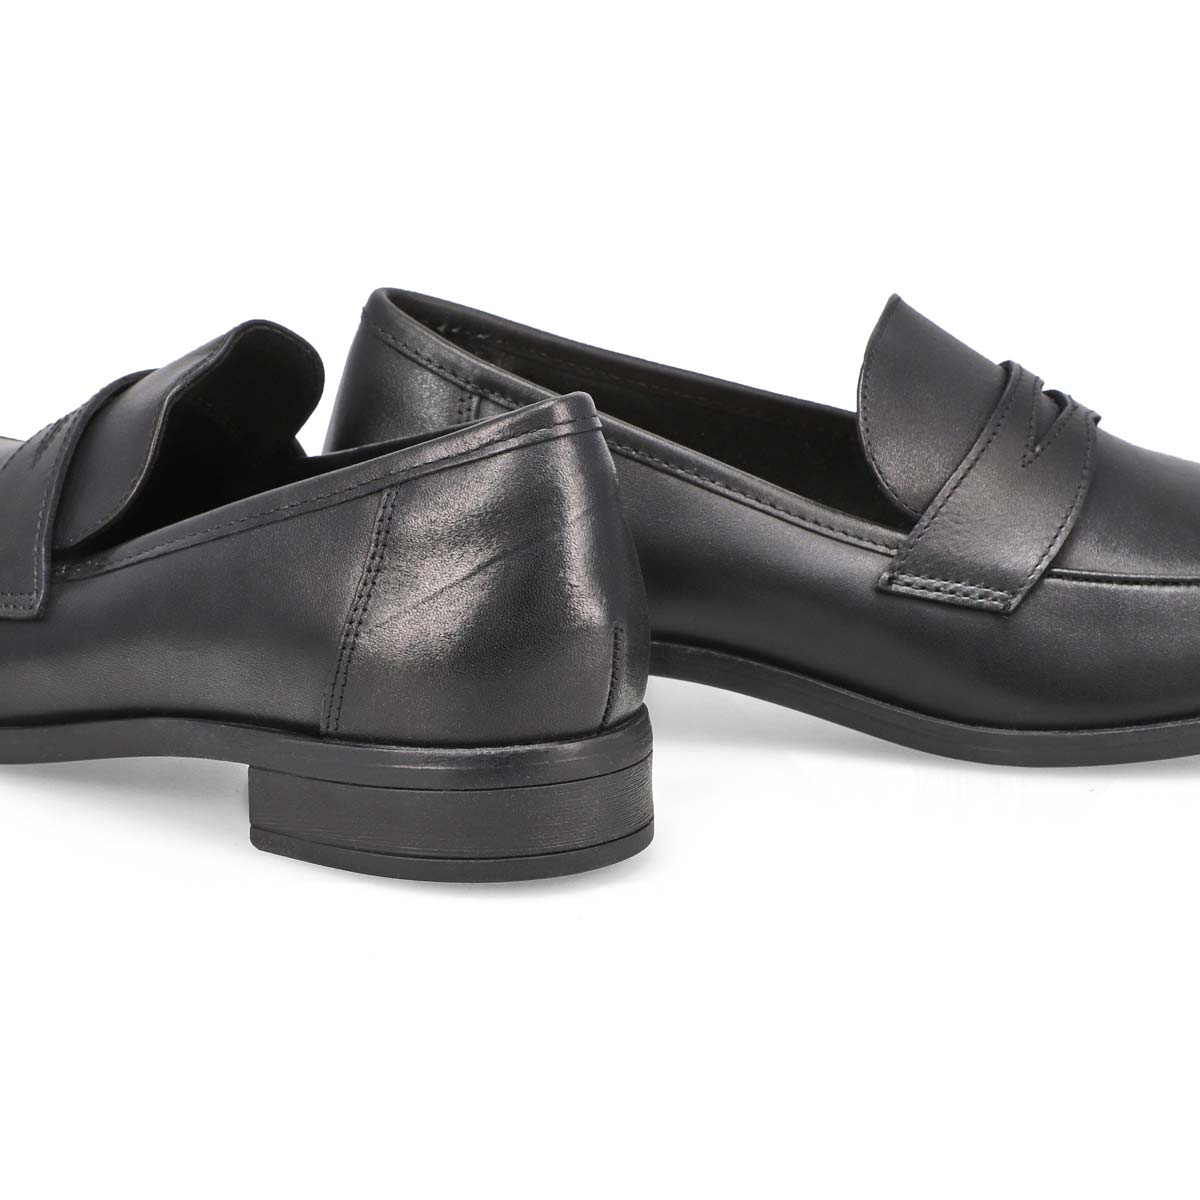 Women's TRISH ROSE black dress loafers